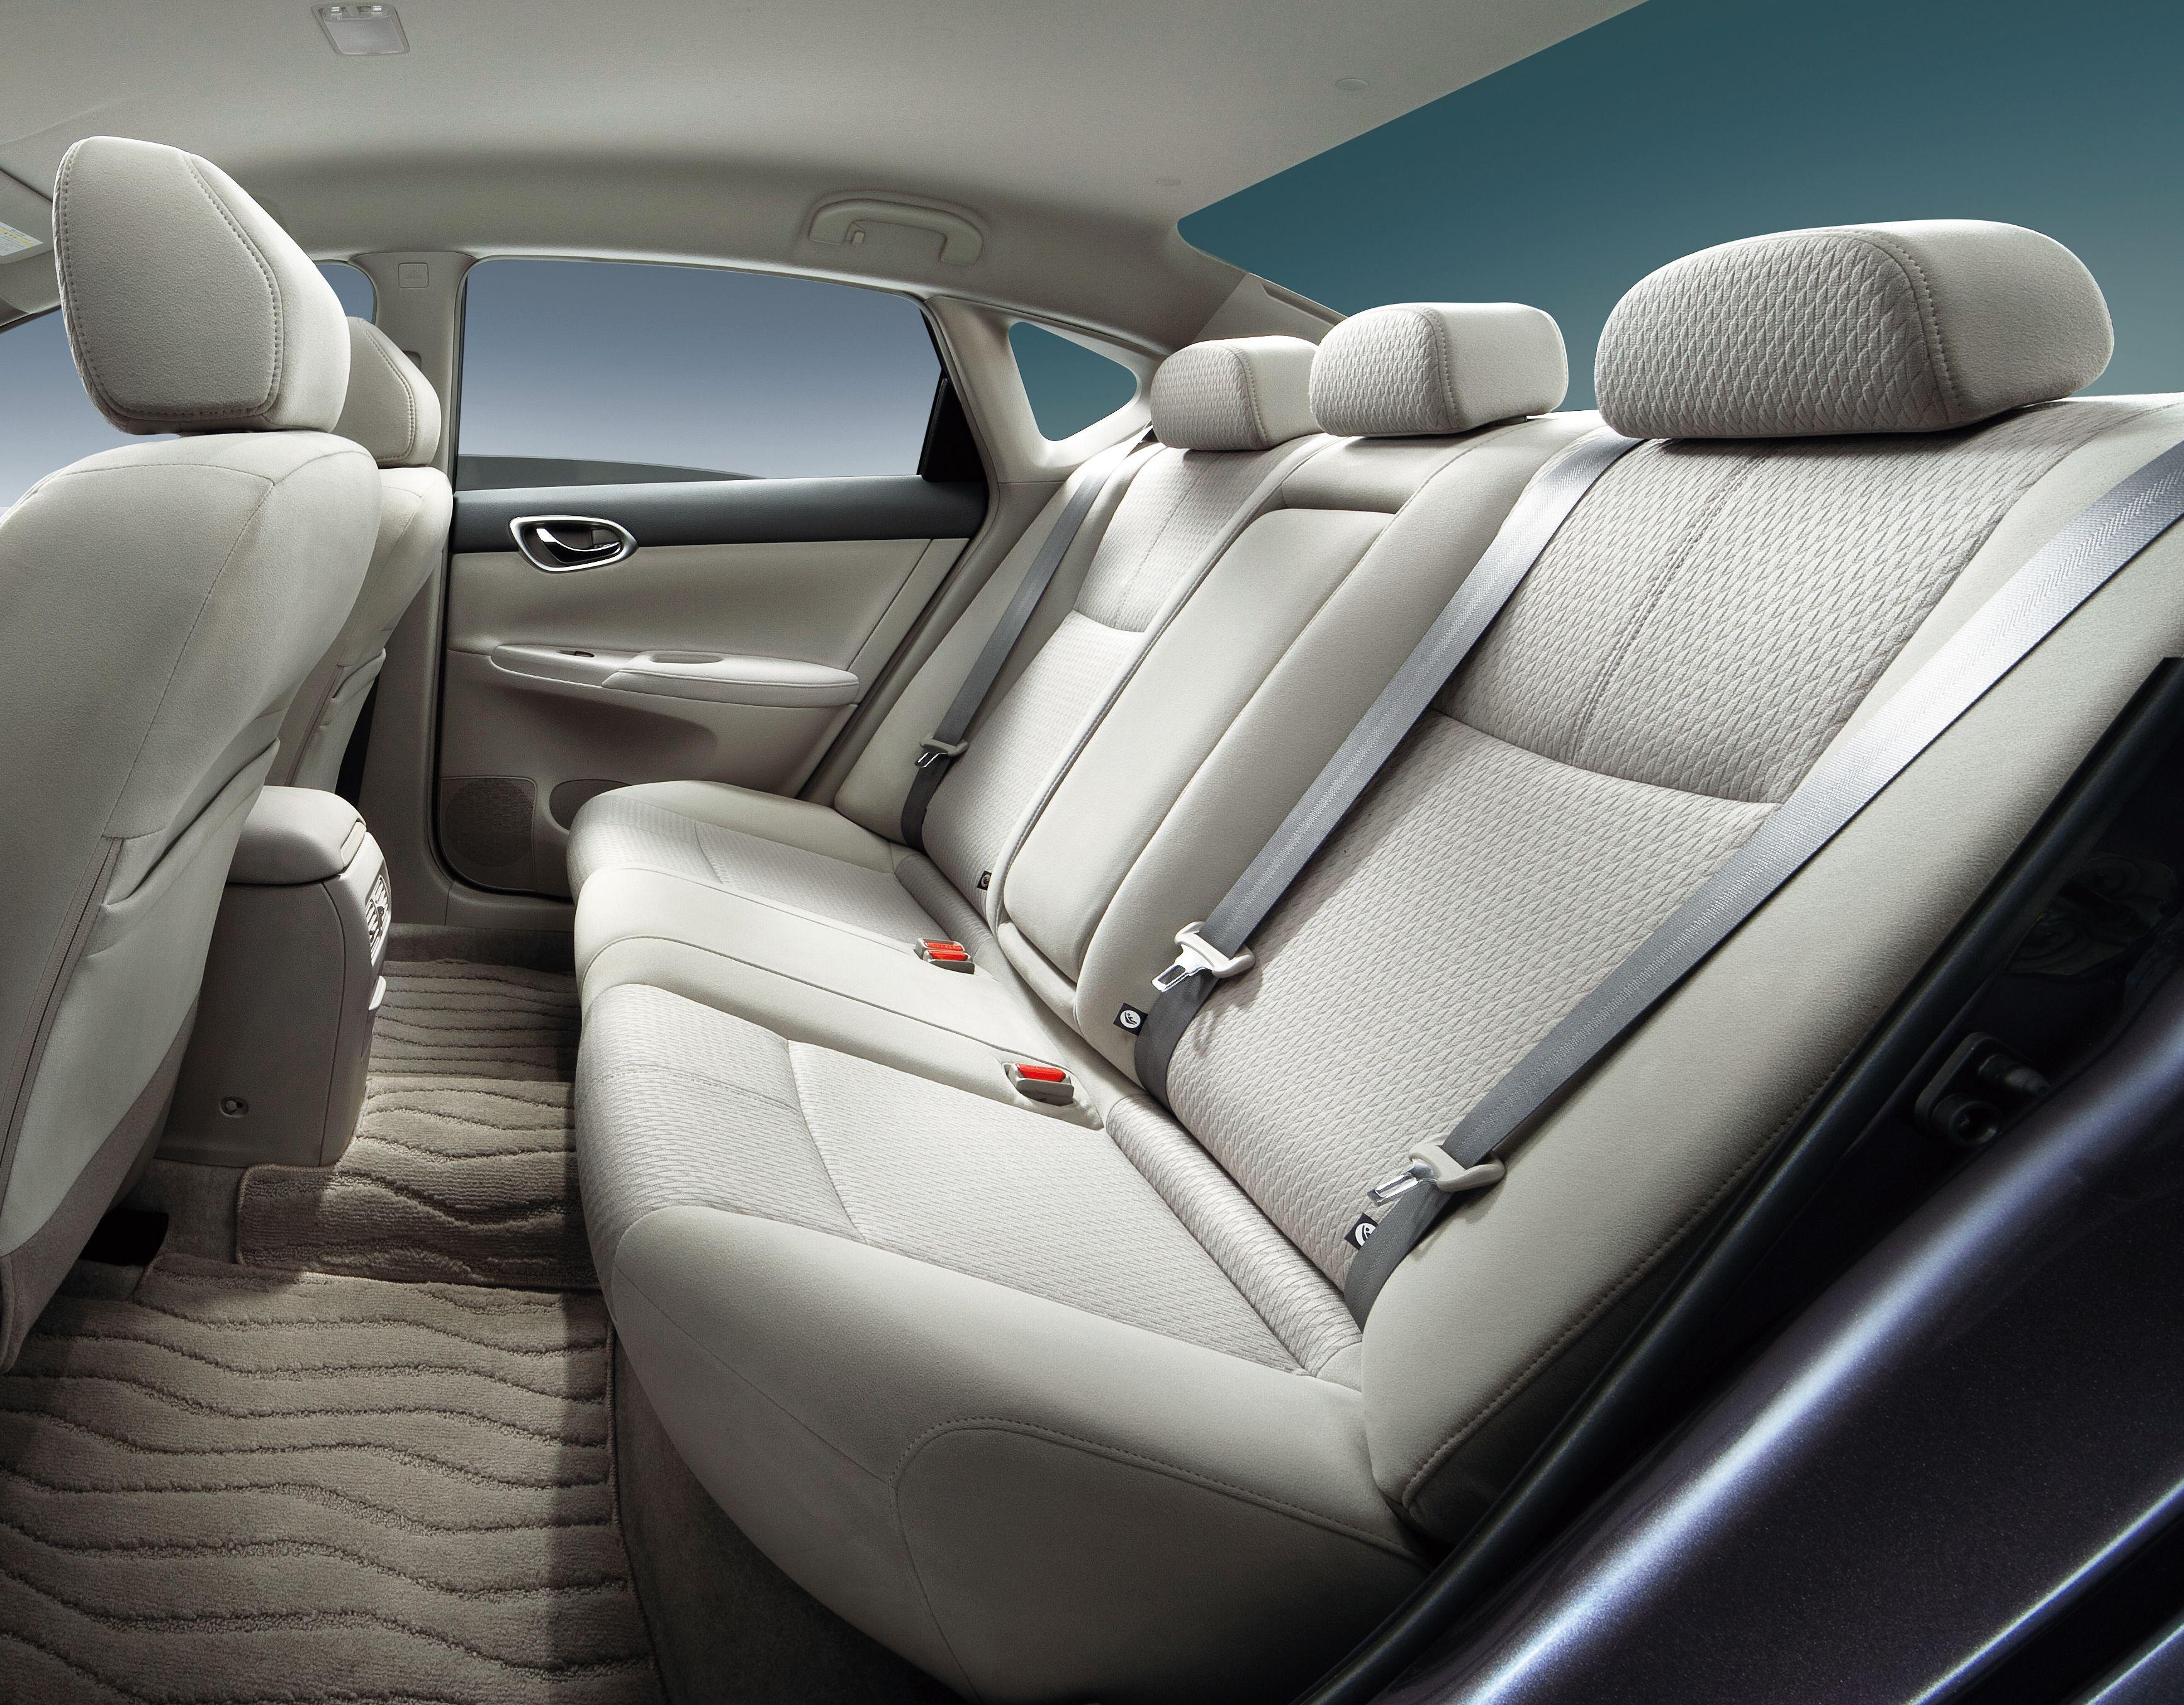 Nissan Sylphy Interiors Seats